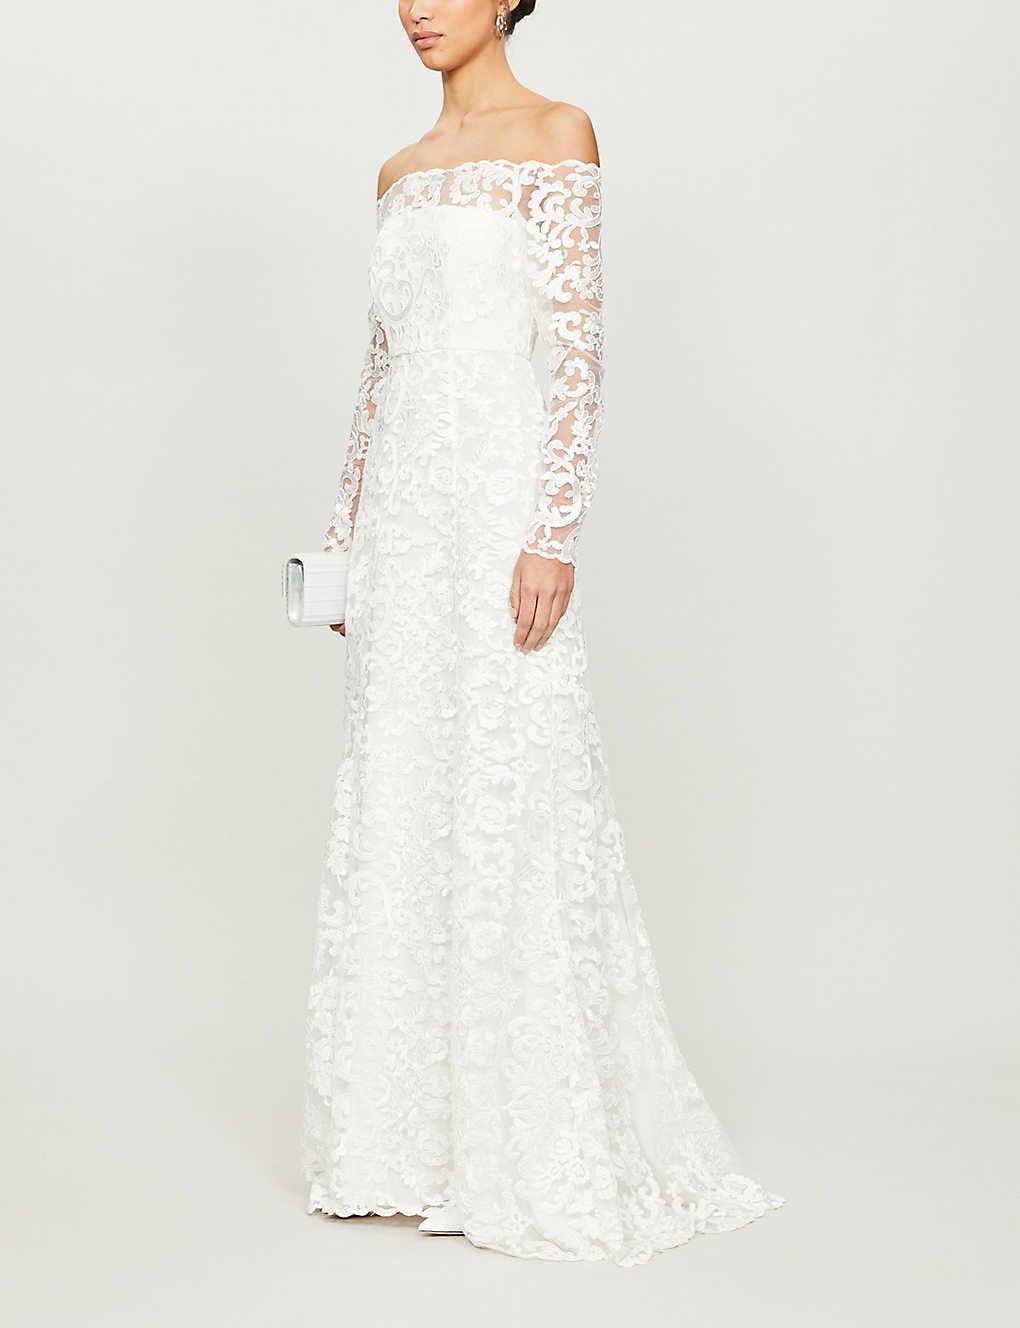 WHISTLES Melba Bardot Lace Wedding Gown